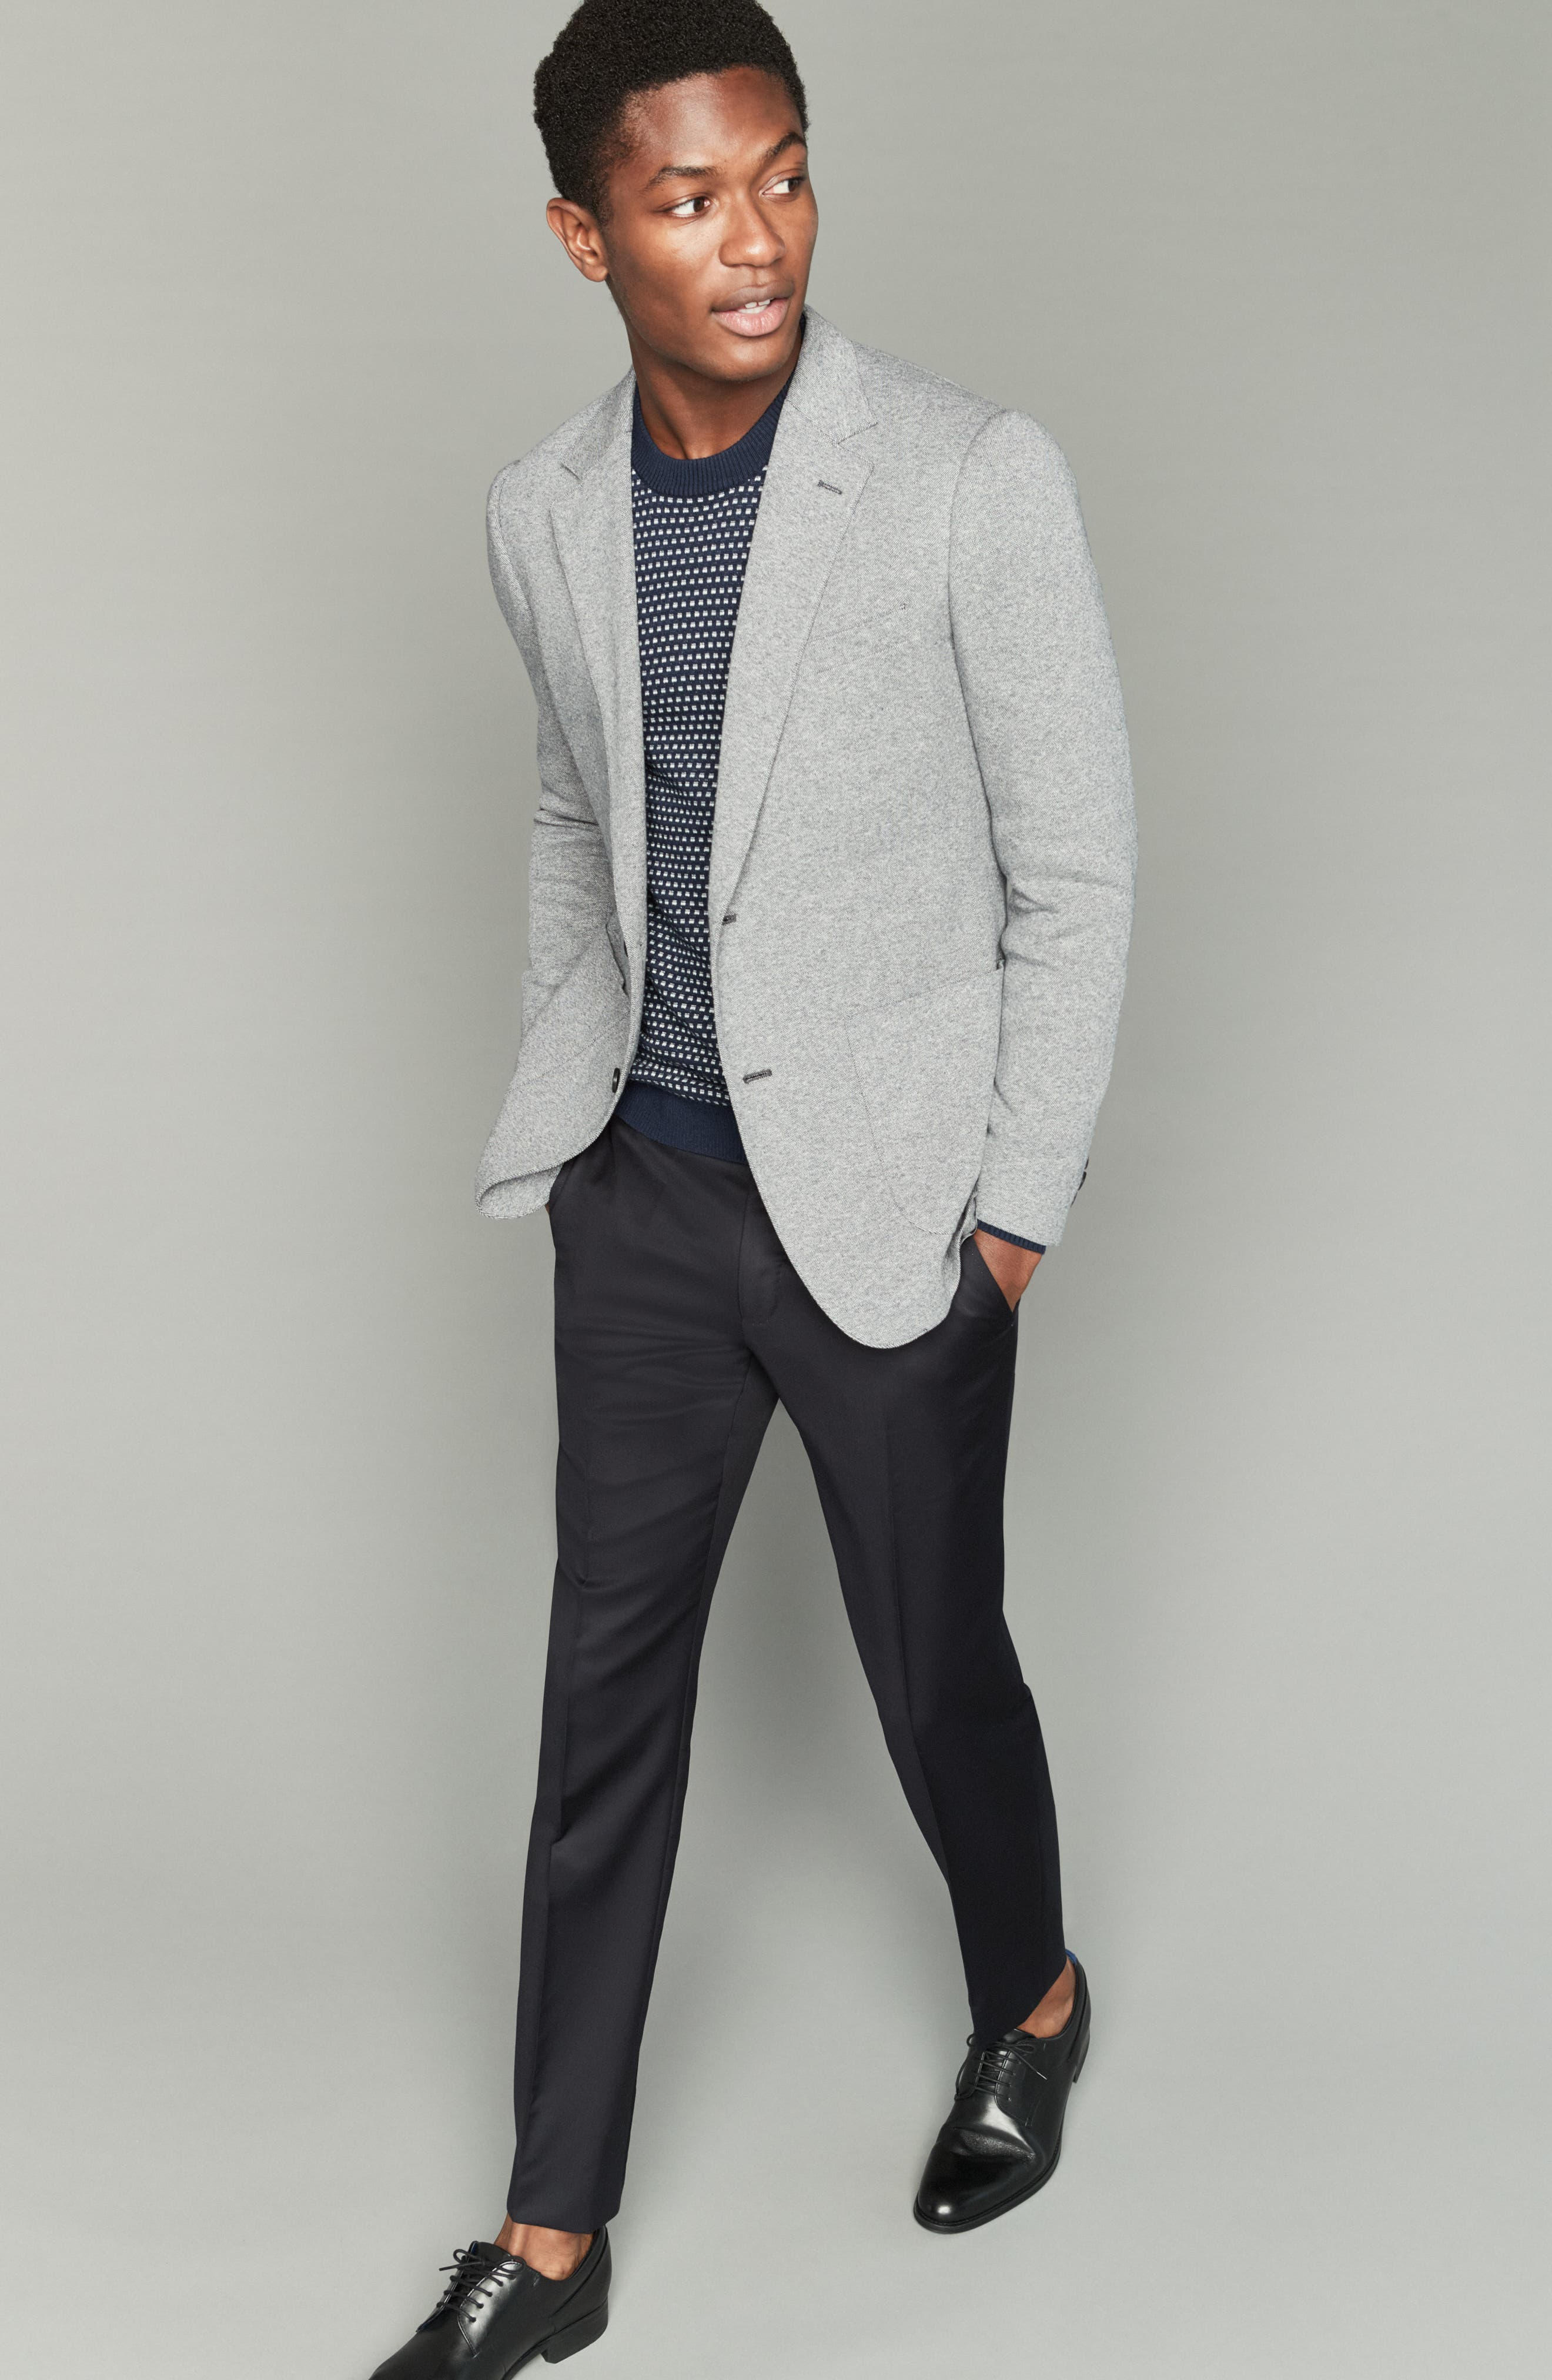 BONOBOS, Jetsetter Slim Fit Knit Cotton Sport Coat, Alternate thumbnail 9, color, LIGHT GREY